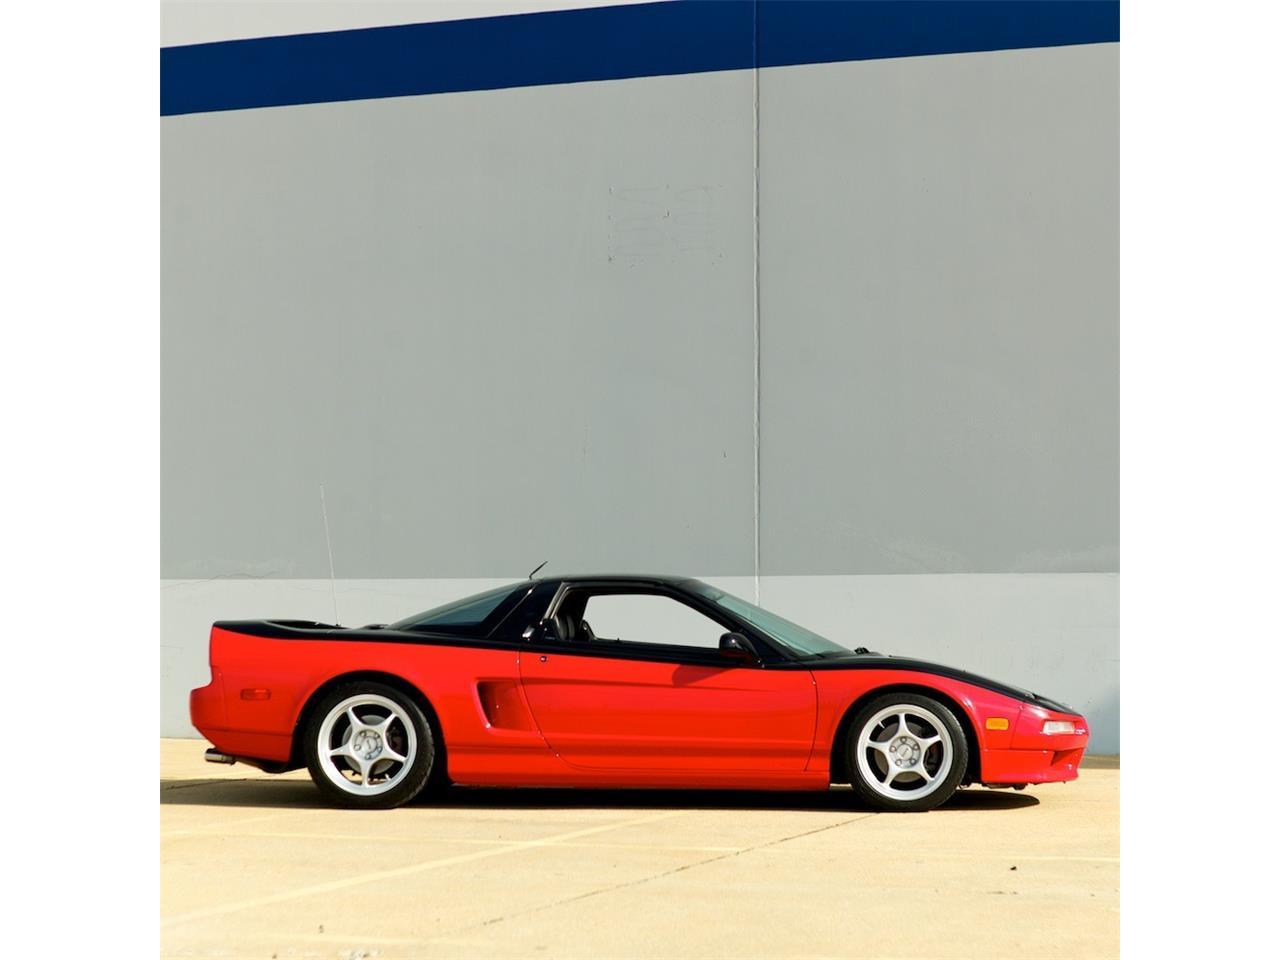 Acura Dealers St Louis >> 1991 Acura NSX for Sale | ClassicCars.com | CC-1087946